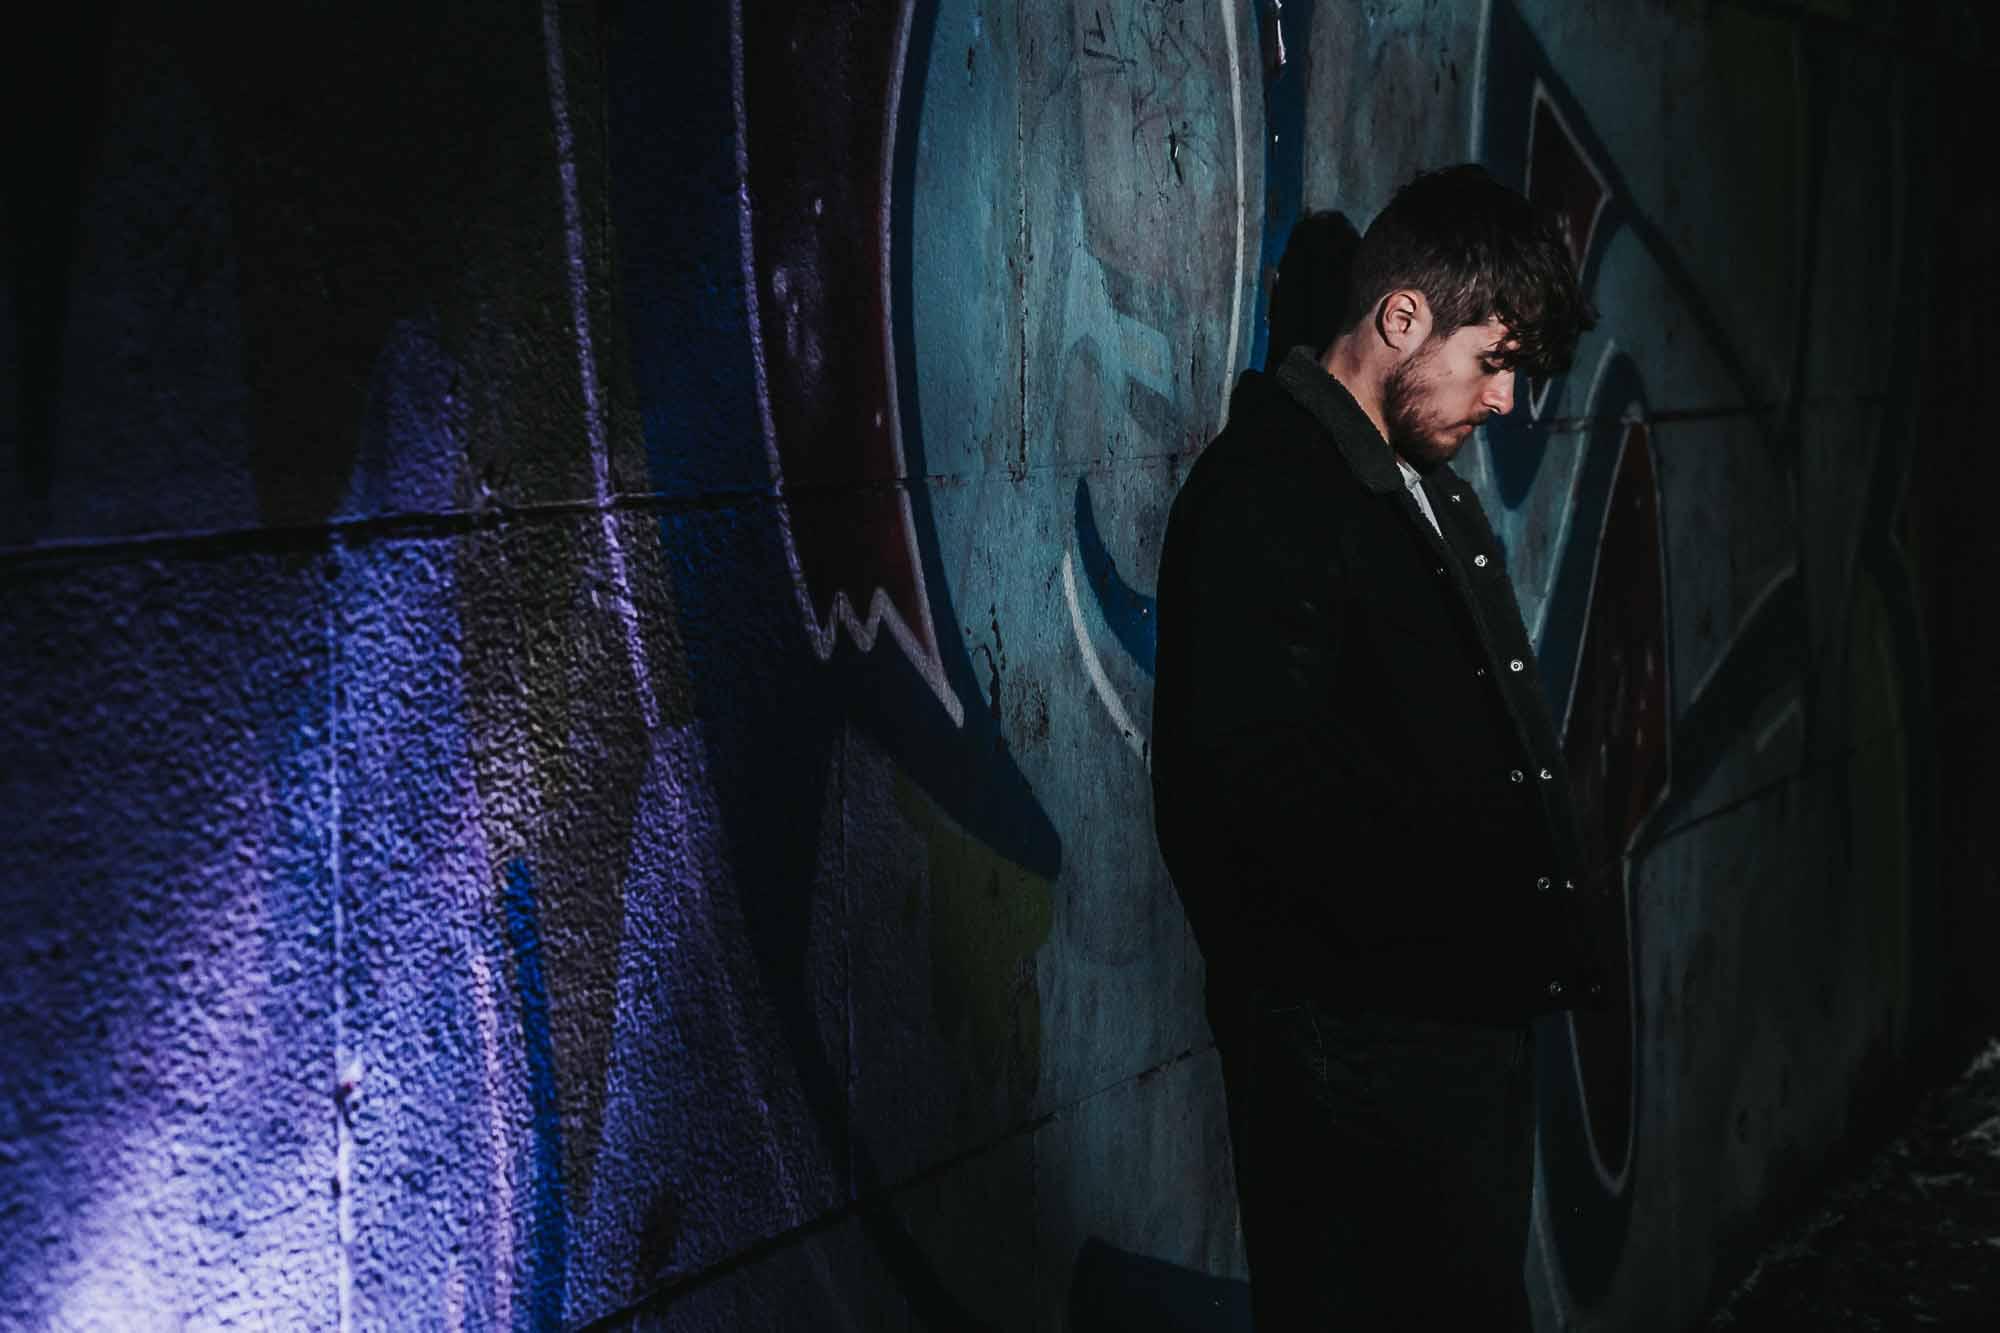 Urban flash portrait of actor/model